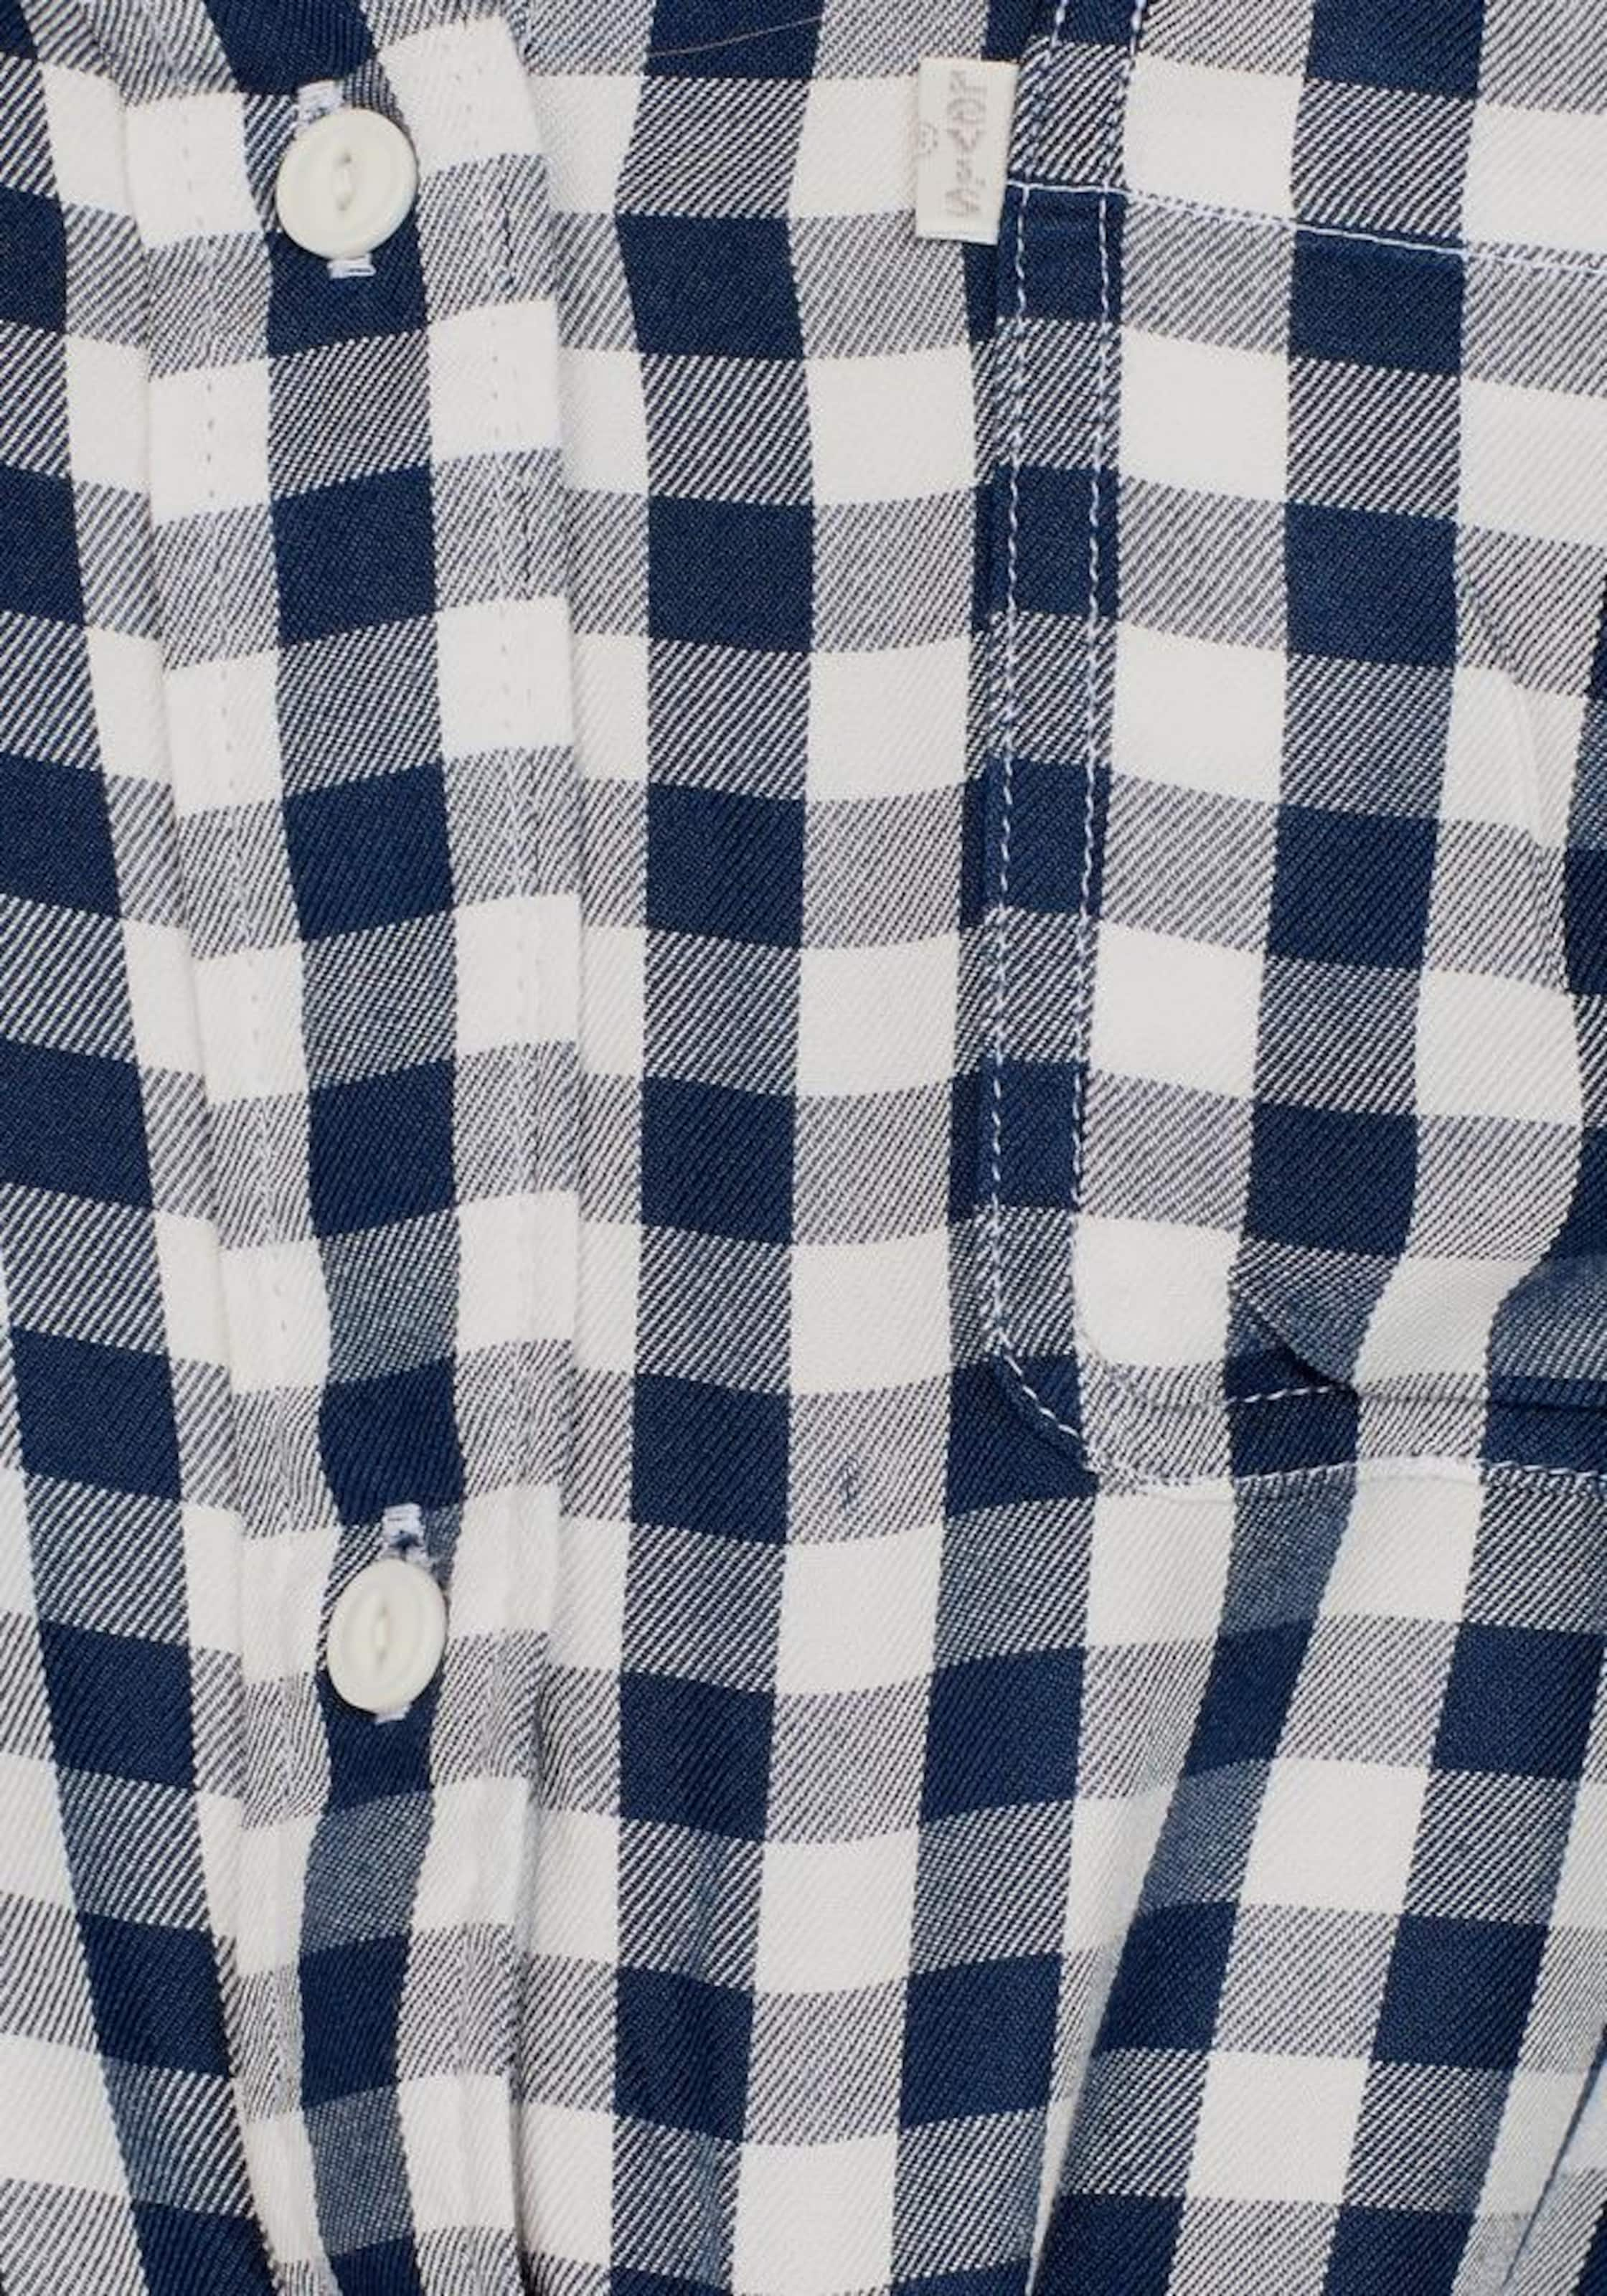 Gemütlich Billig 100% Original LEVI'S Hemdbluse 'Ryan one Pocket' oYQyX6